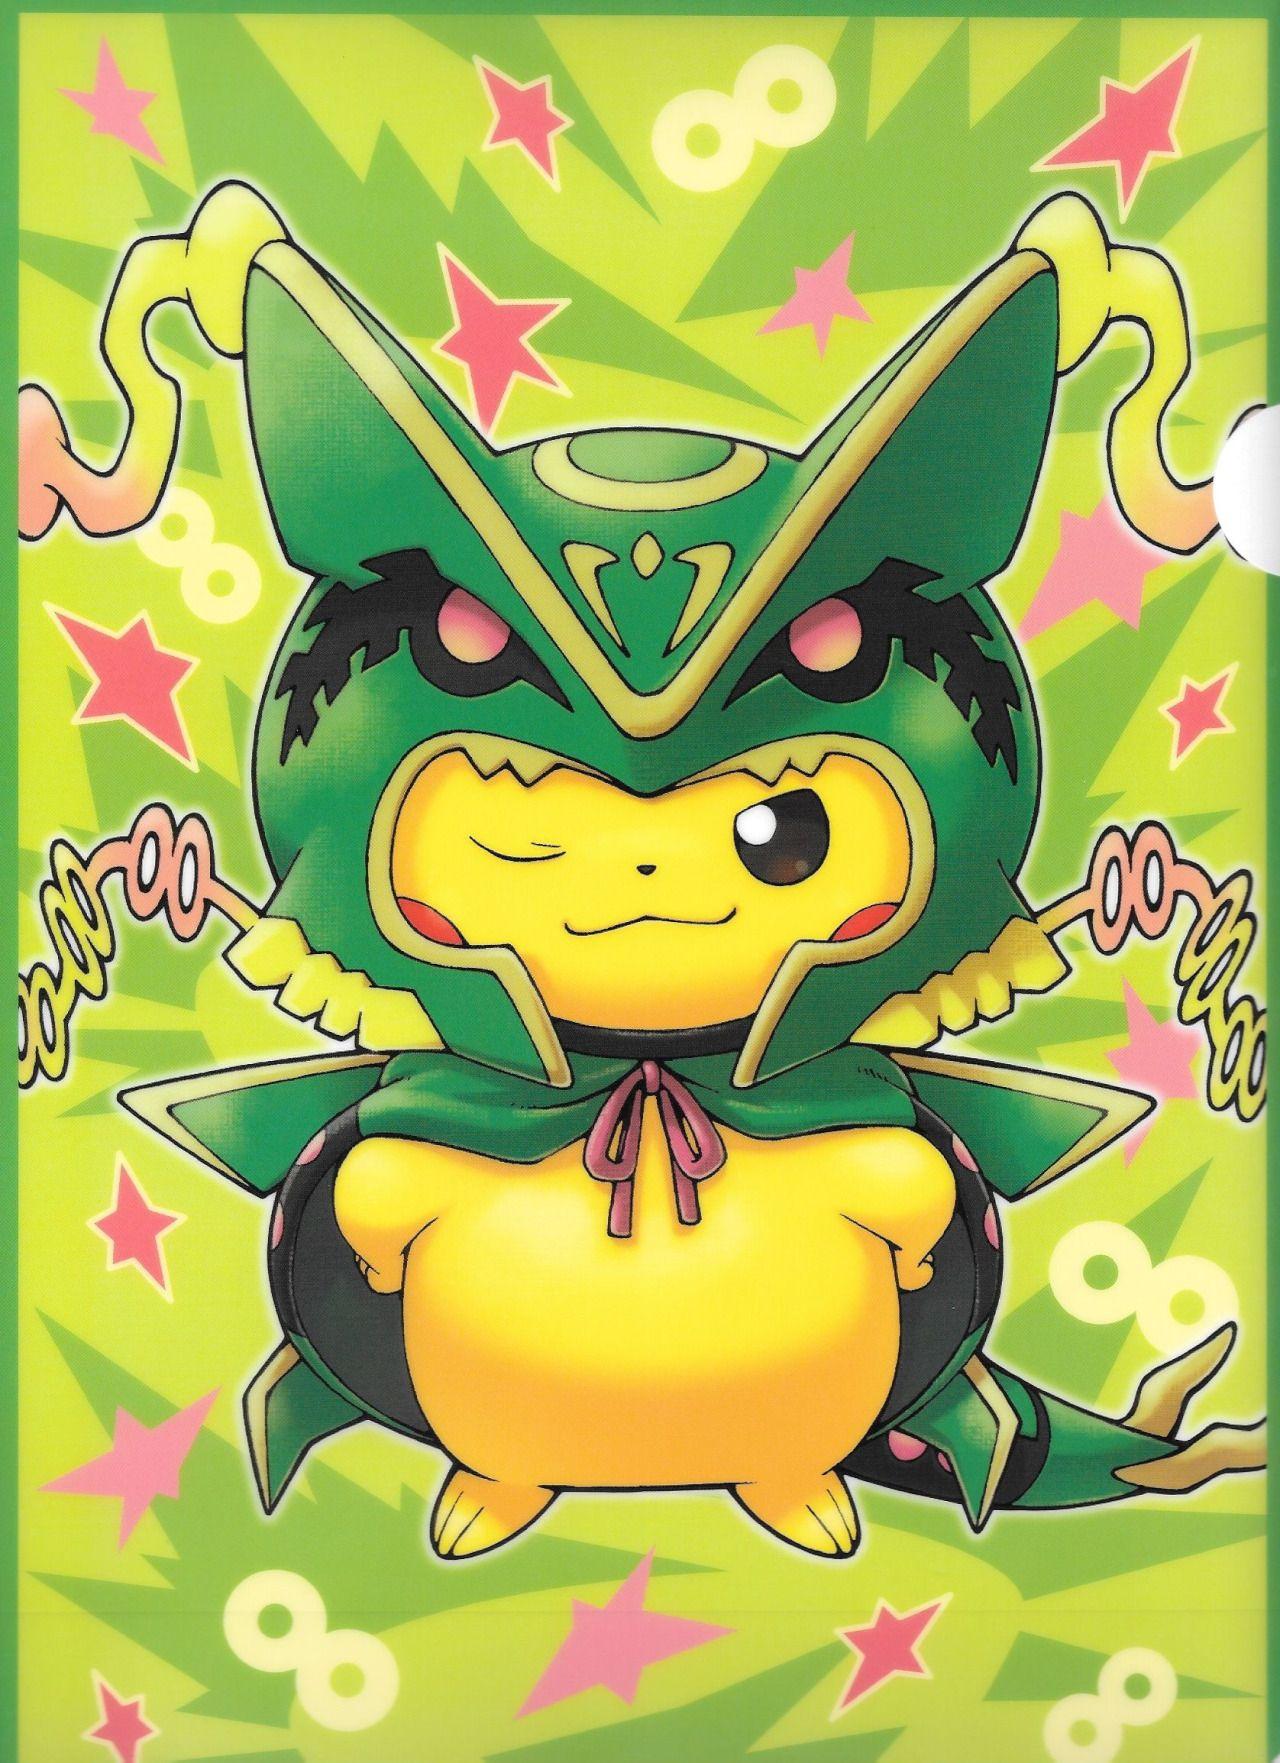 Pikachu Mega Rayquaza ポケモン かわいい ピカチュウのイラスト